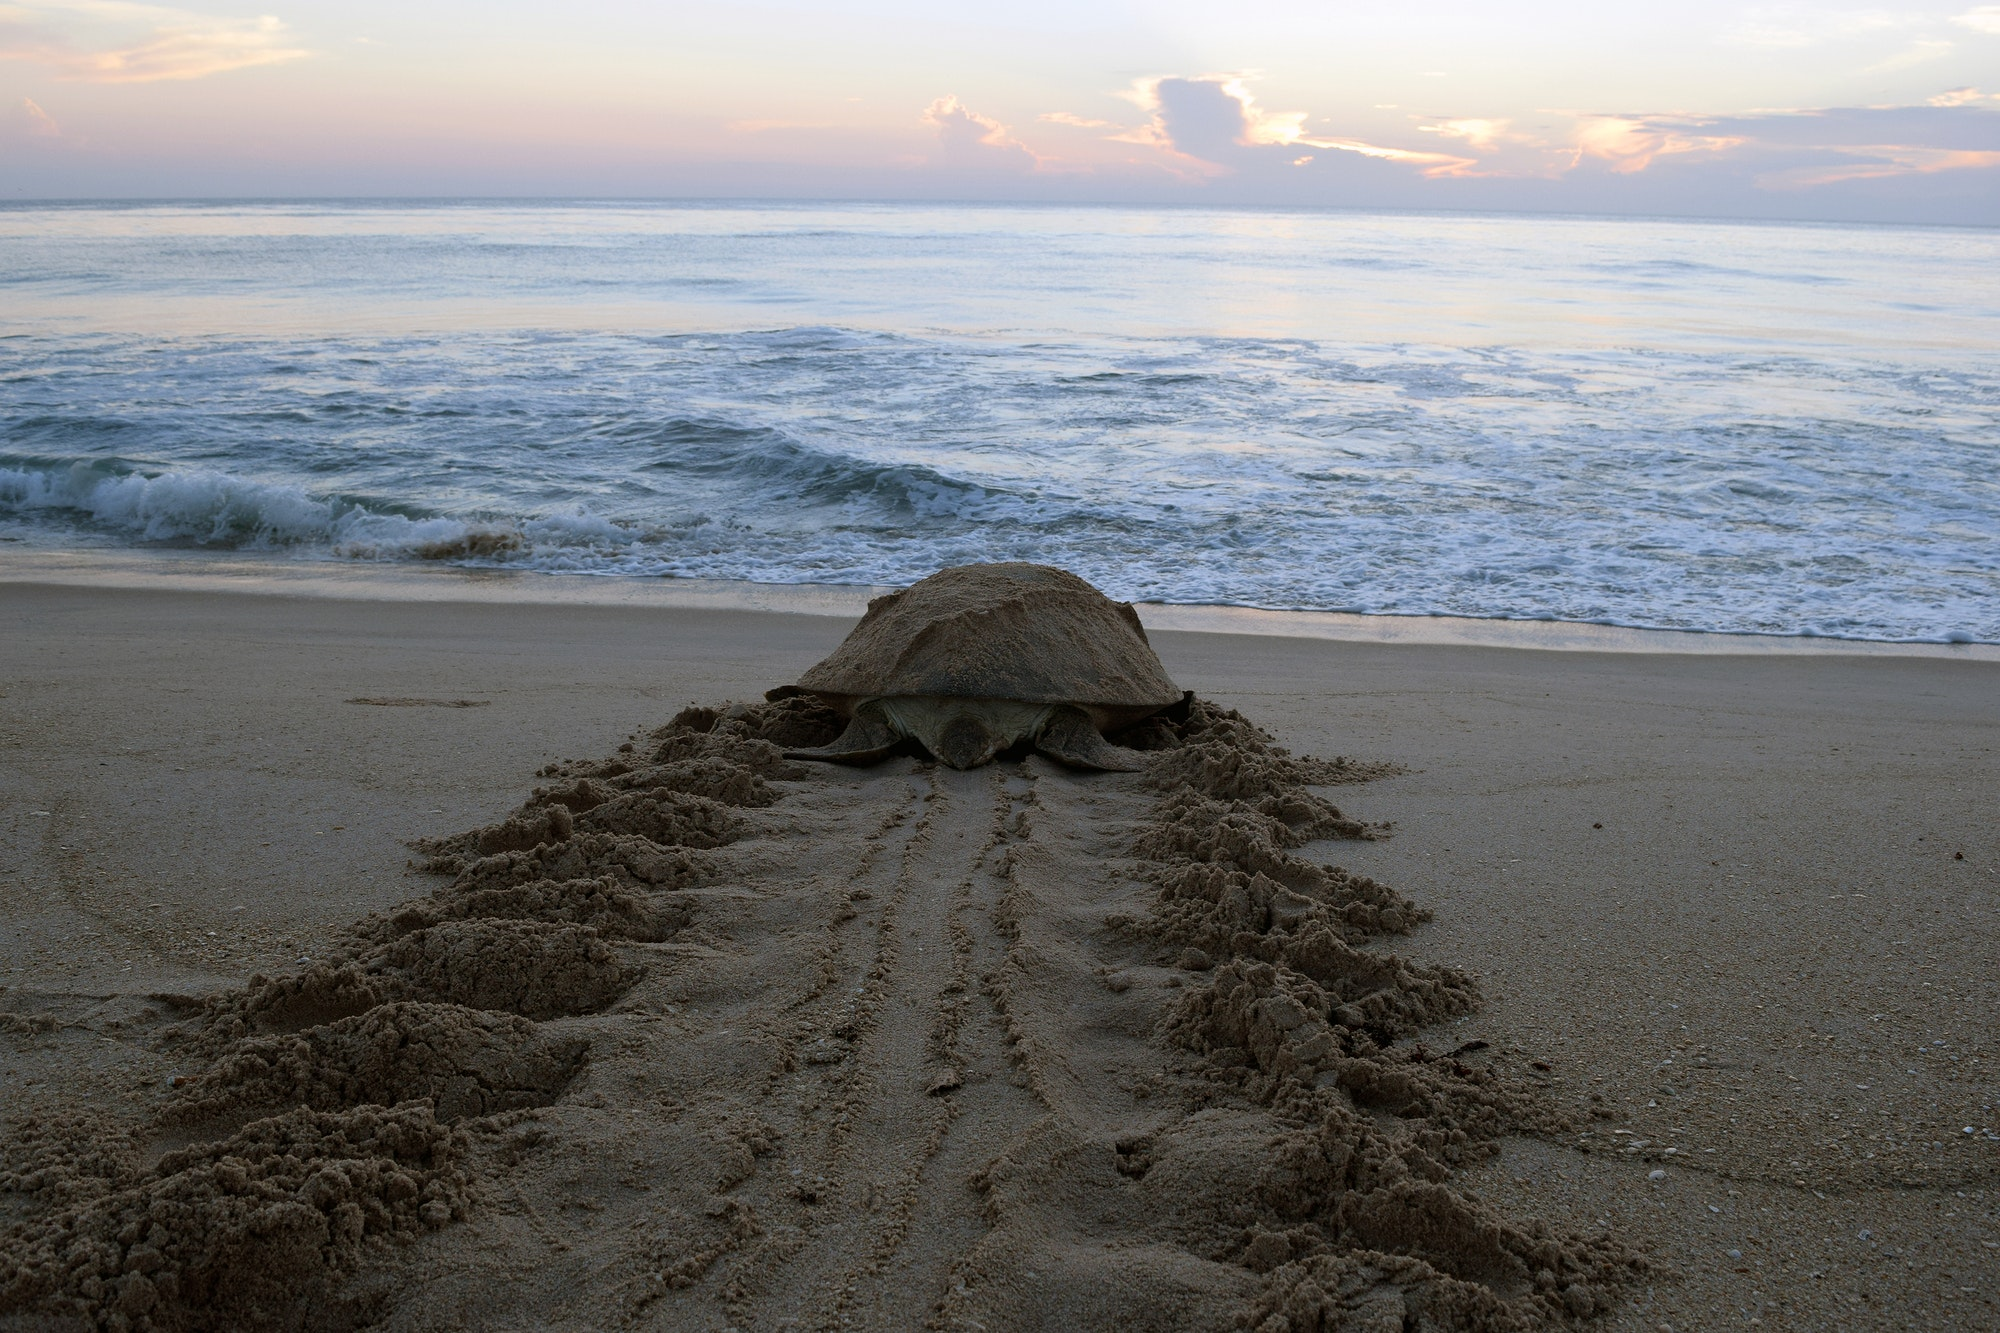 green sea turtle headed back to beach with tracks on beach